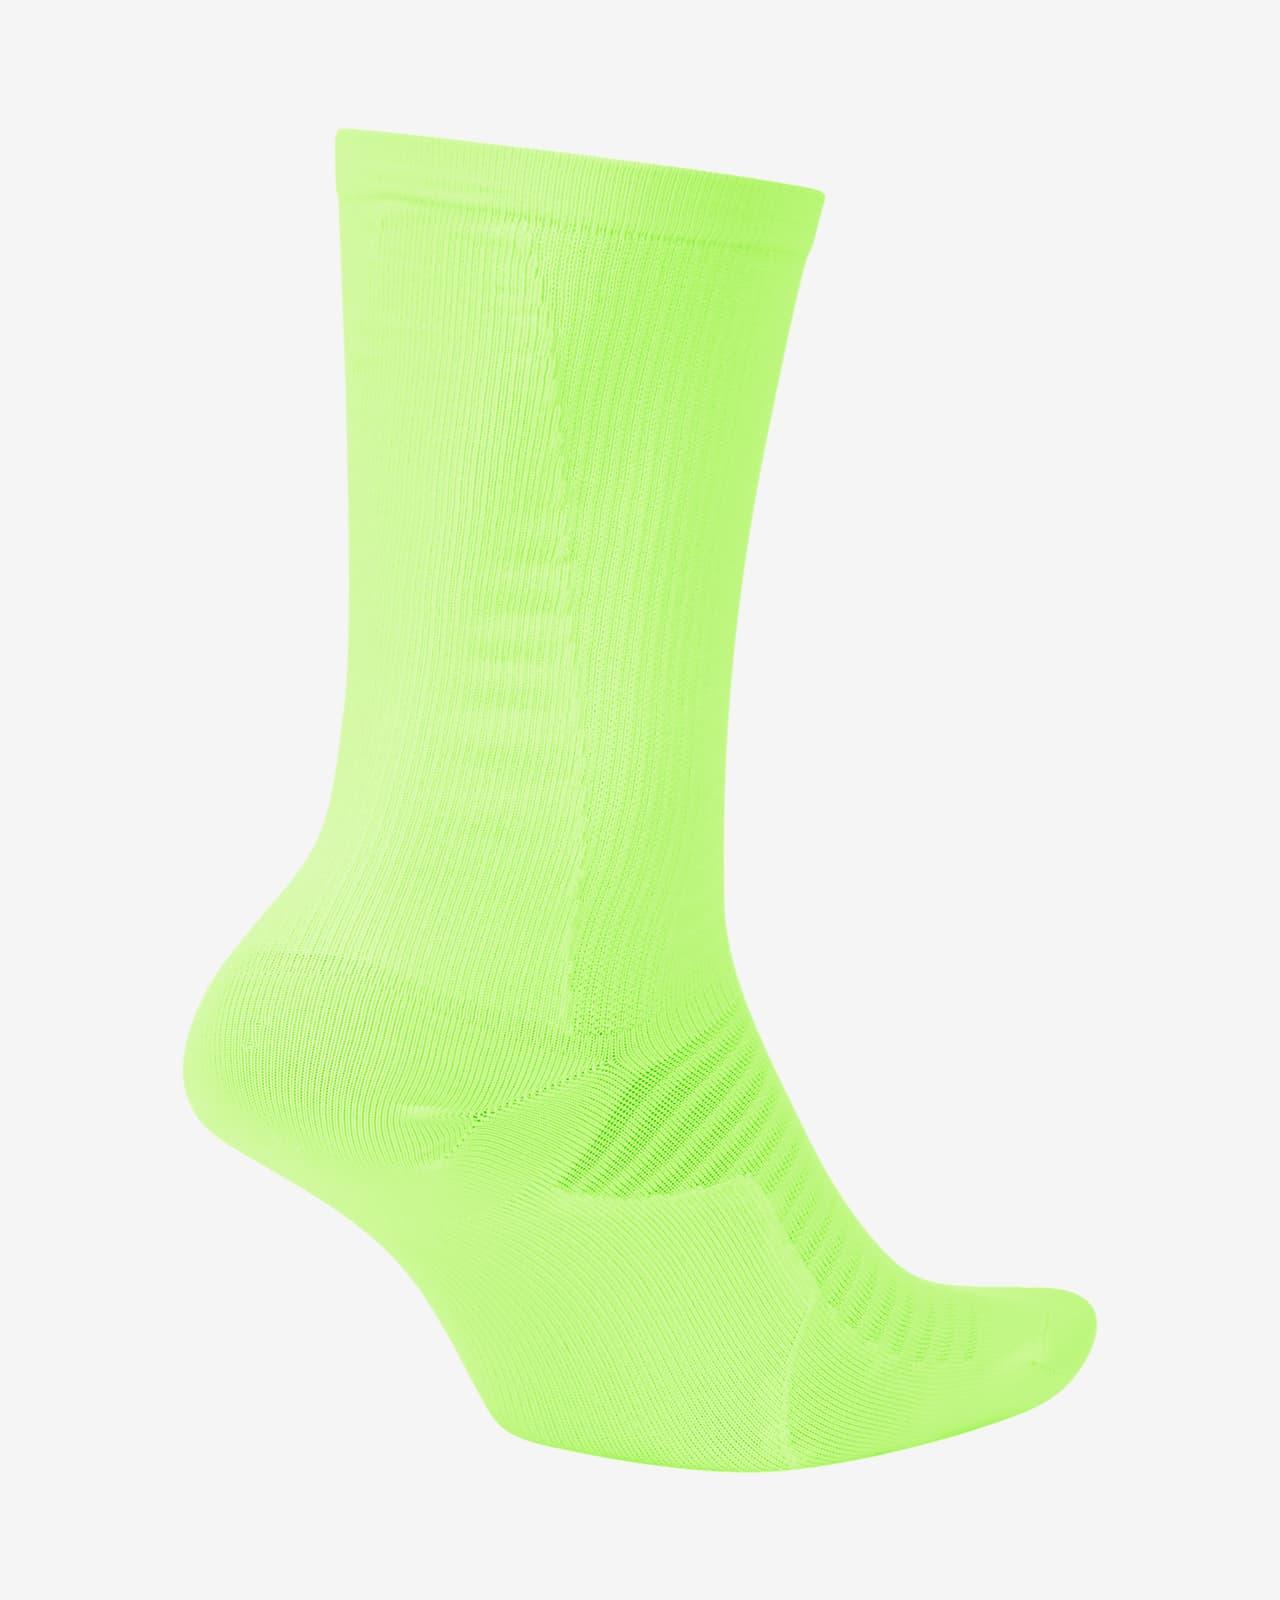 Sperimentare Quale alias  Nike Spark Lightweight Crew Running Socks. Nike LU